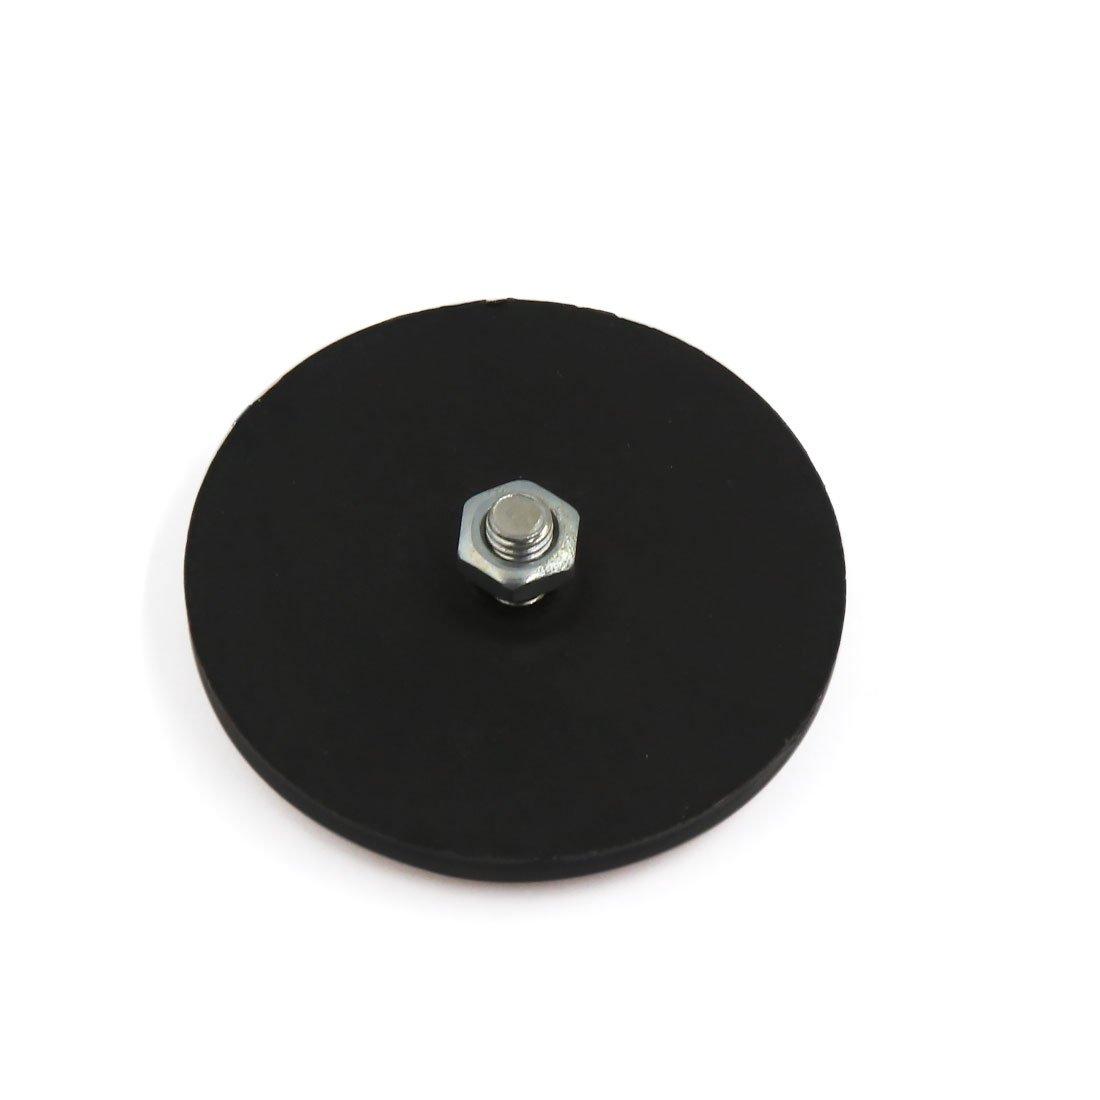 uxcell 5 Pcs Orange Black Round Shape Reflective Reflector for Motorcycle